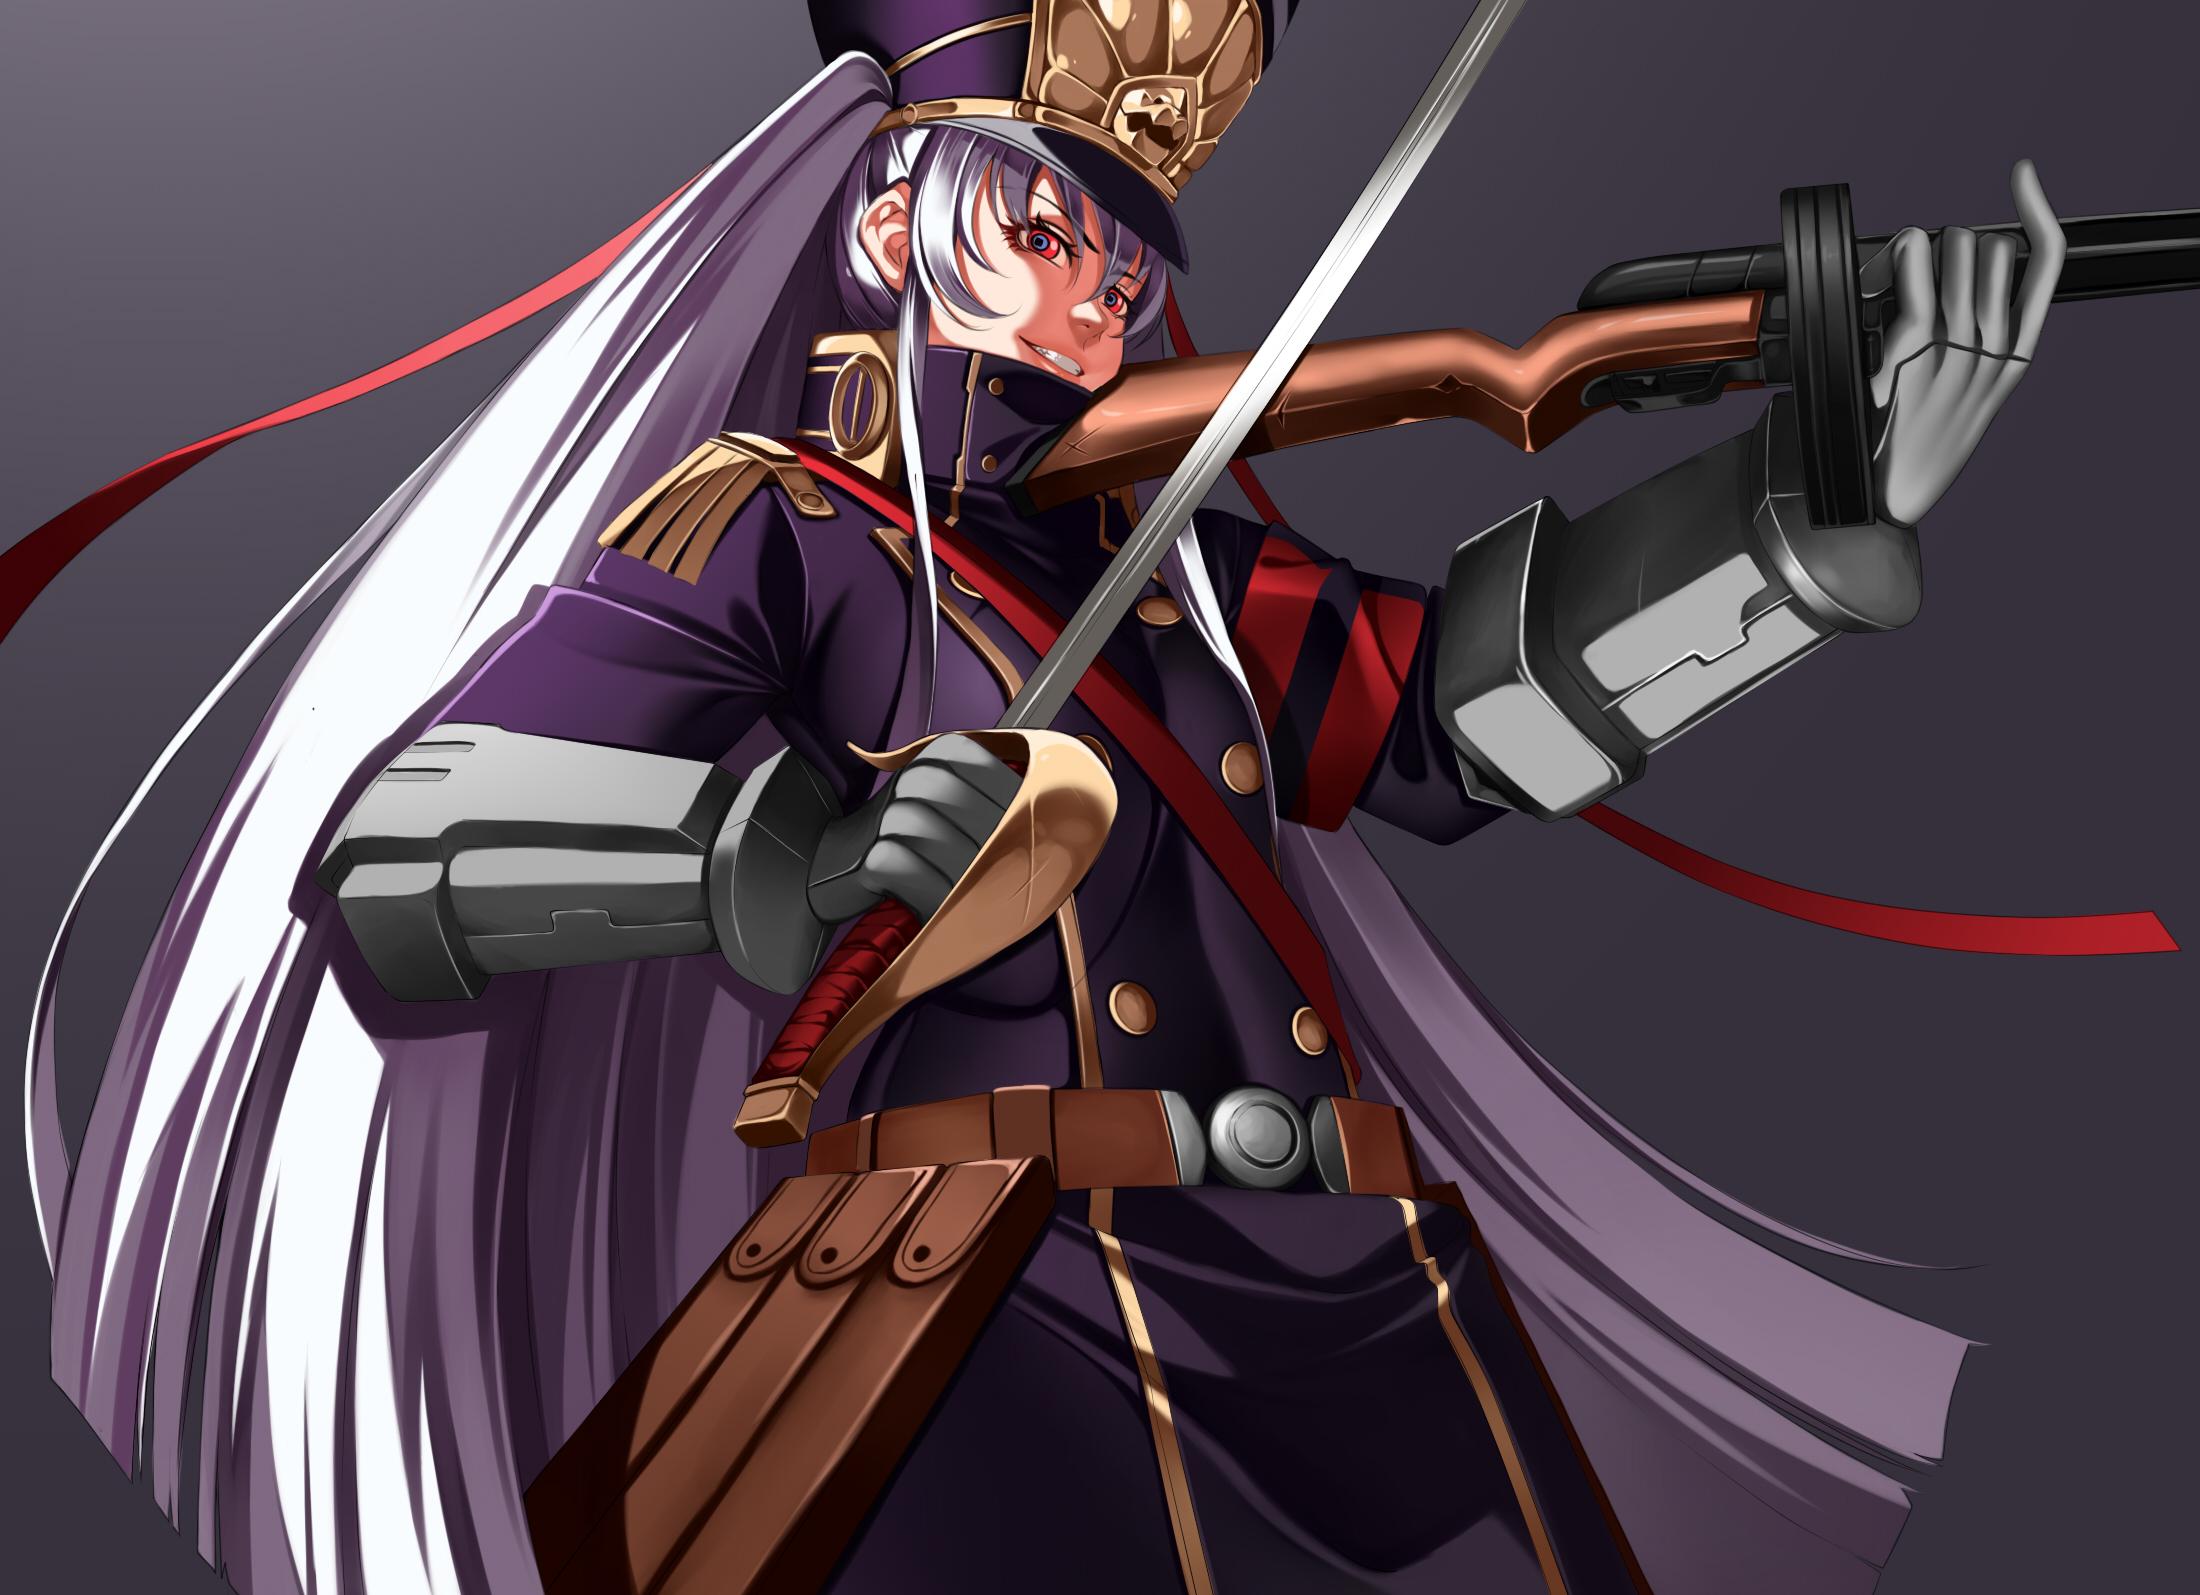 Anime/Re:Creators (720x1280) Wallpaper ID: 677918 - Mobile